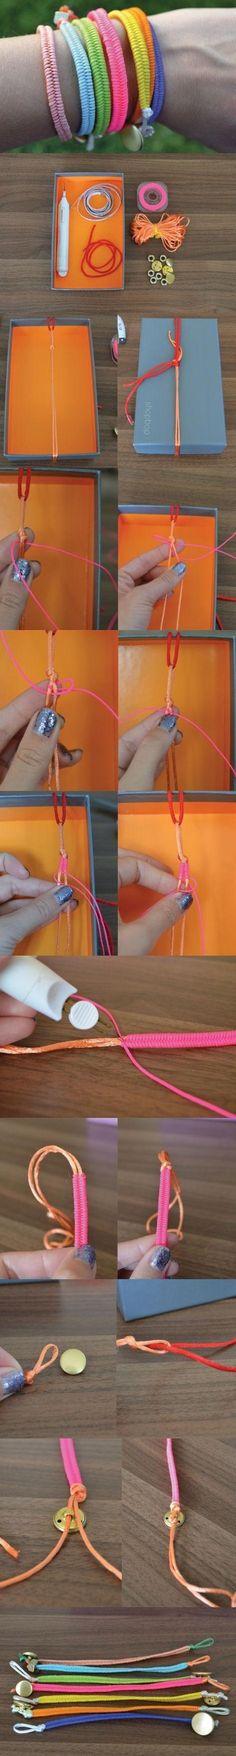 DIY Fishtail Bracelet DIY Projects   UsefulDIY.com